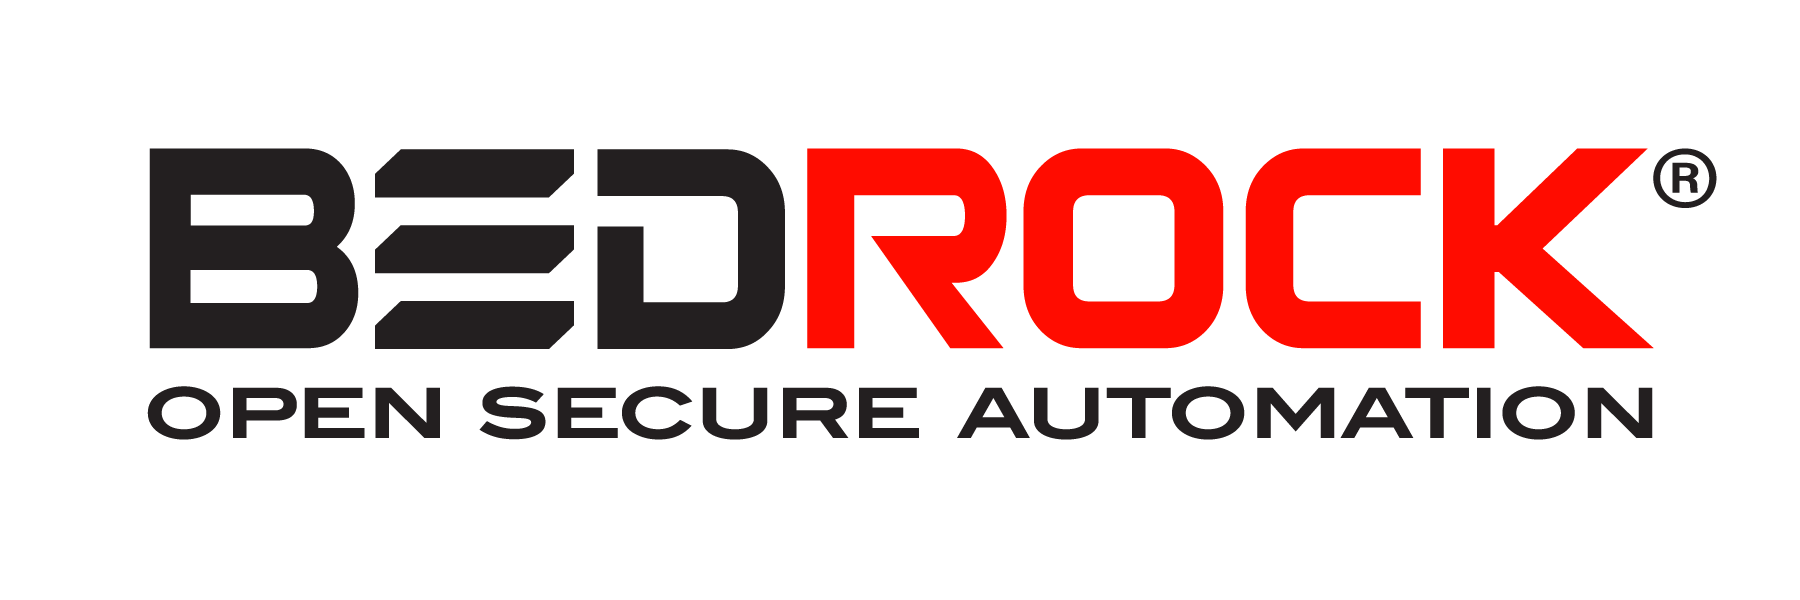 Bedrock Automation